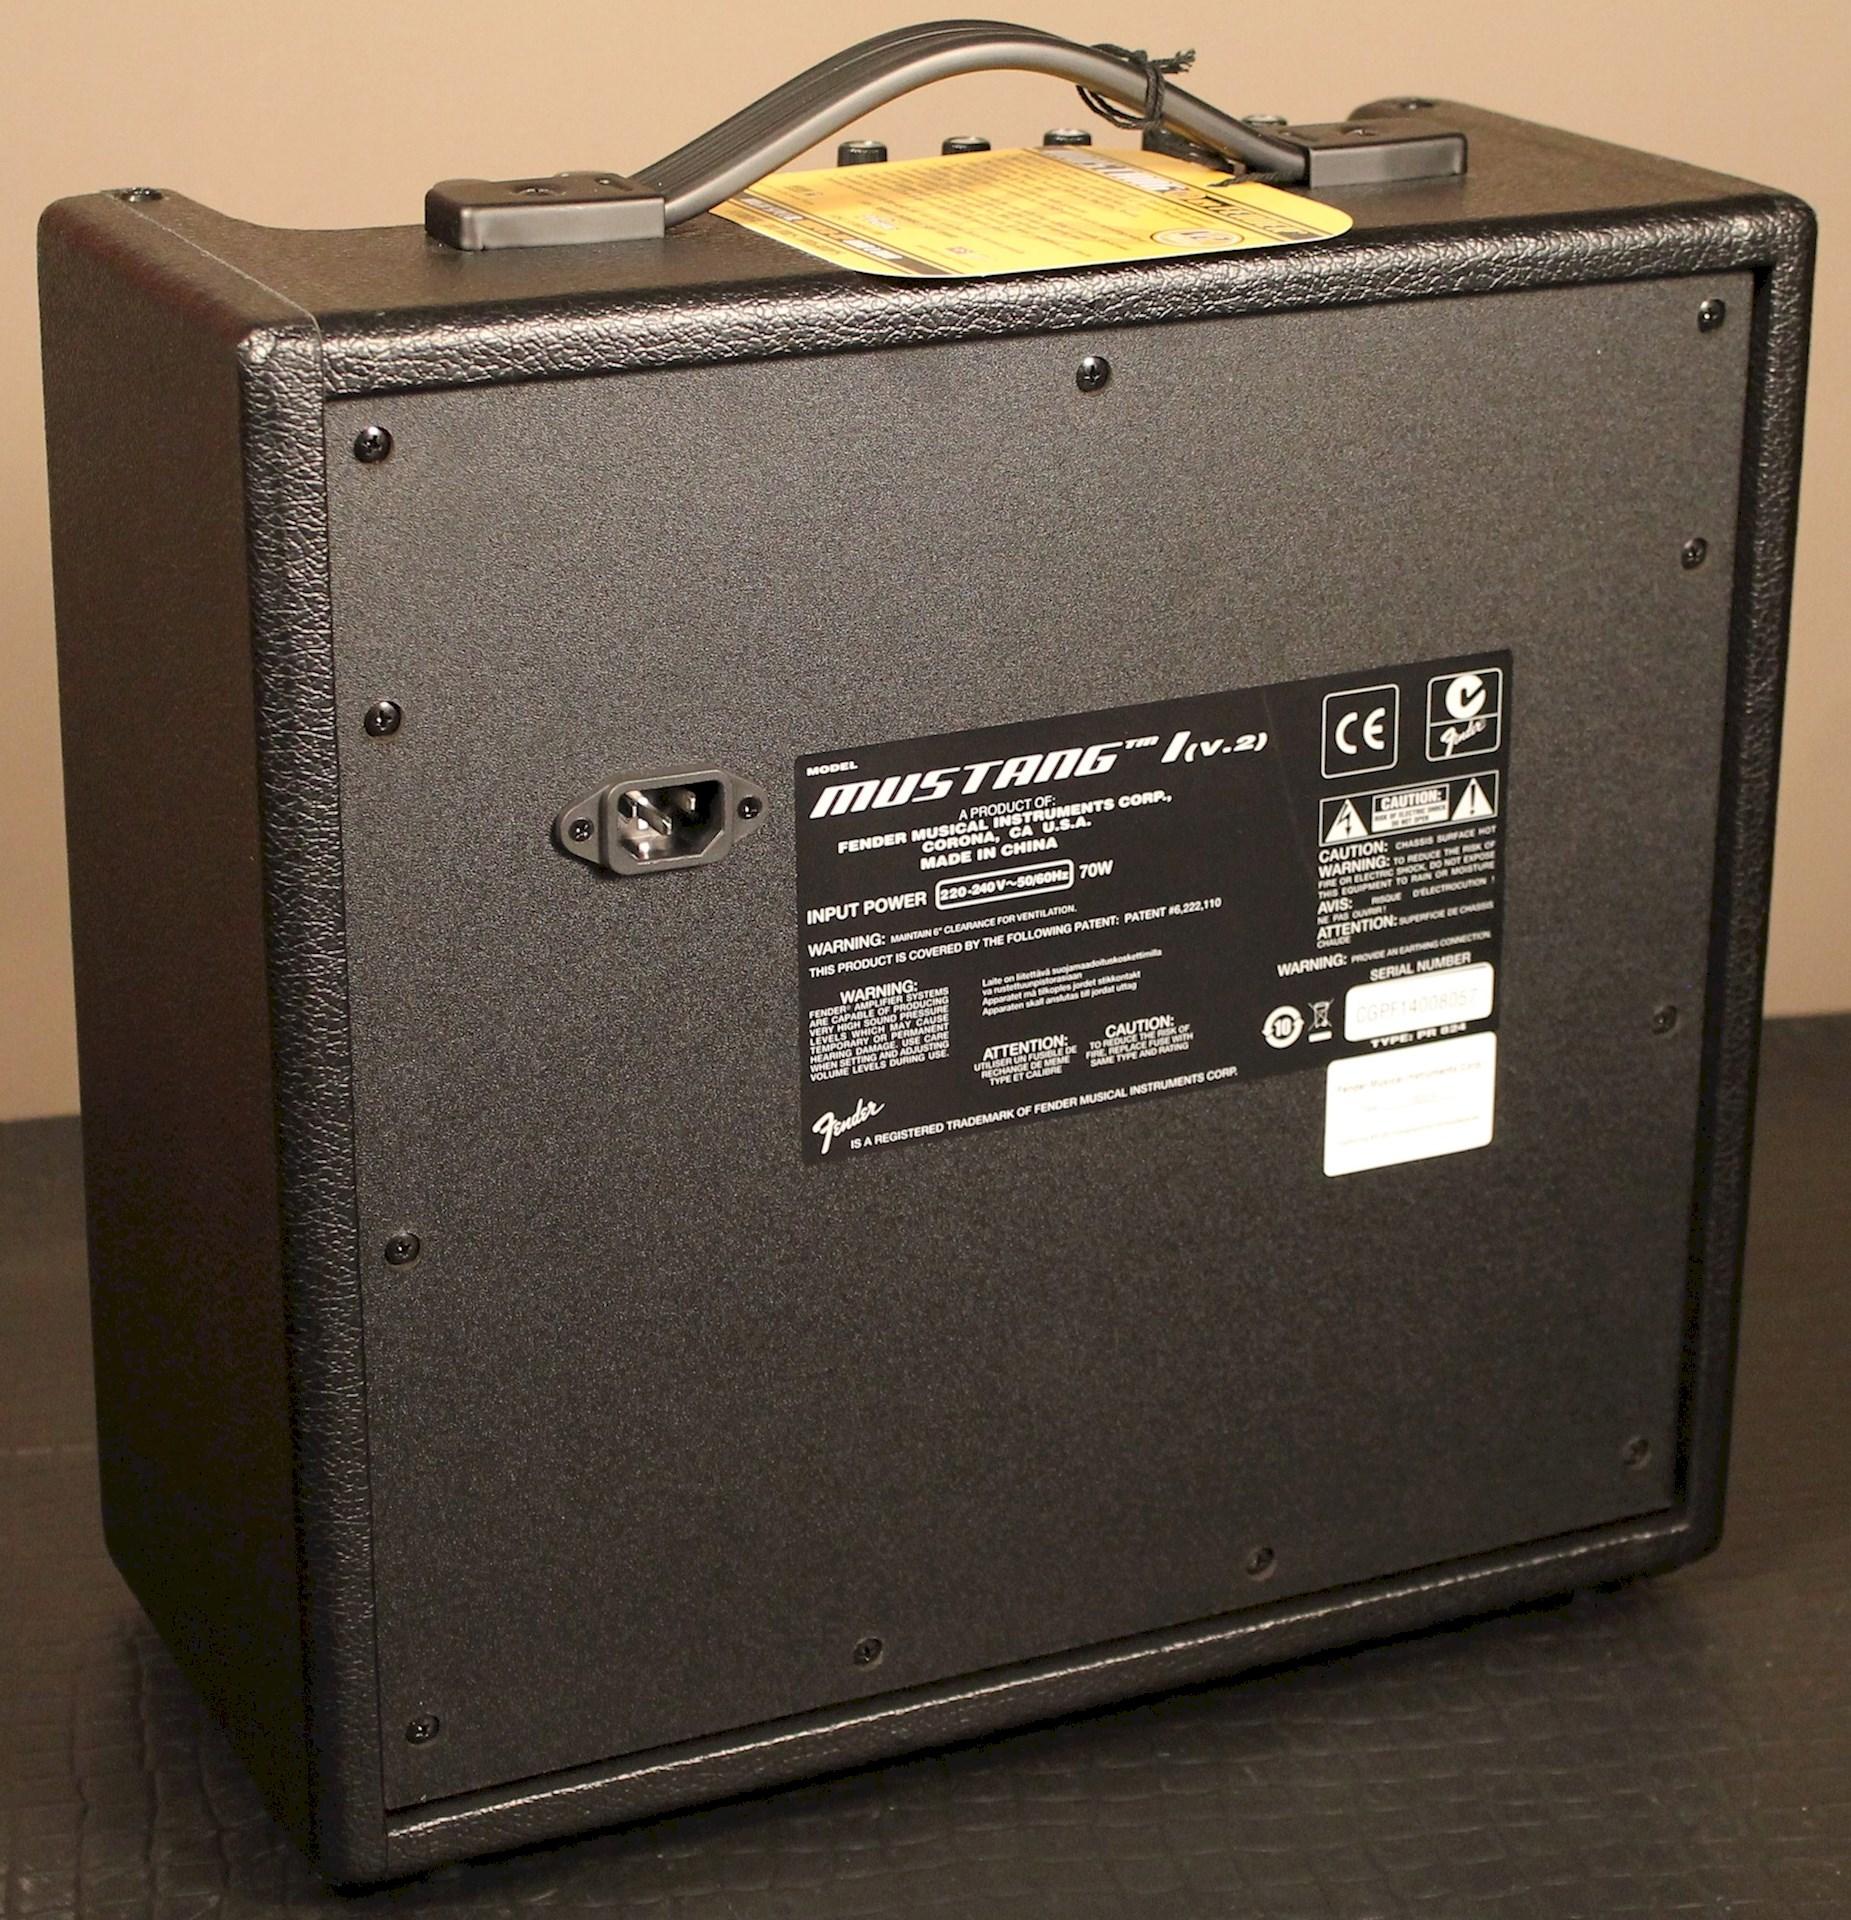 fender® forums • view topic - fender mustang 1 (v.2 ) amp outlet plug